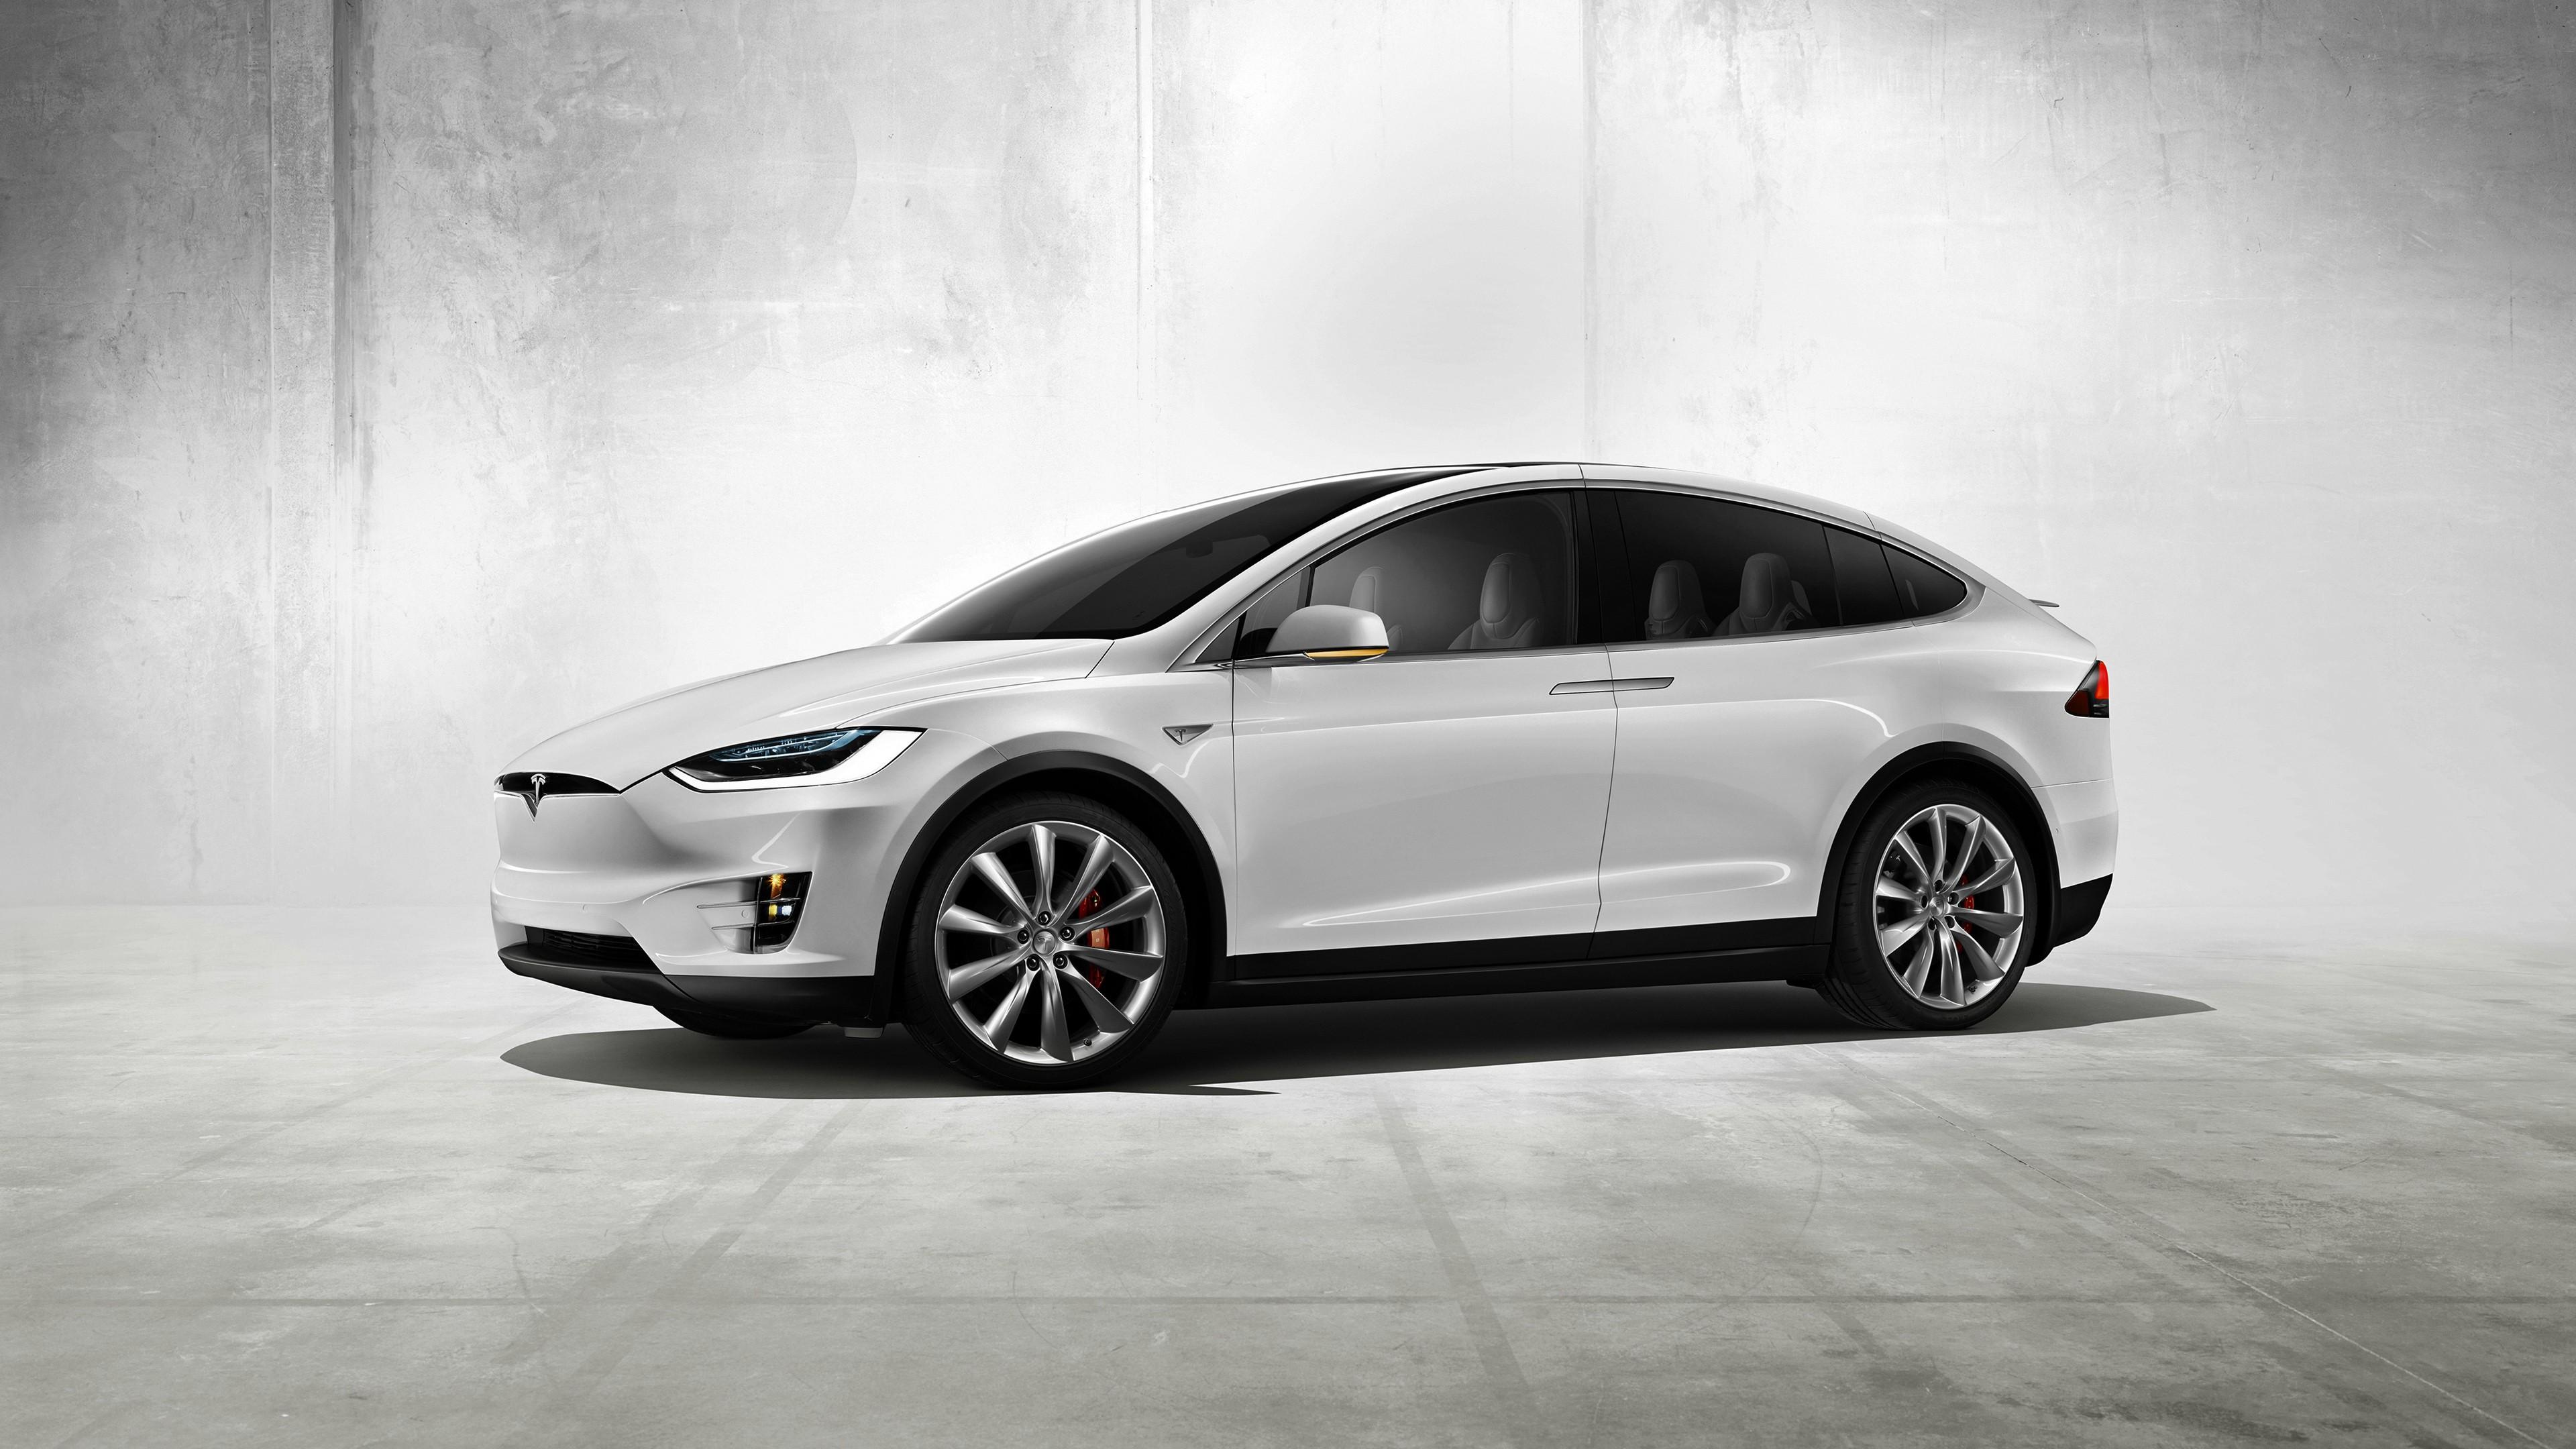 Hintergrundbilder : Auto, Fahrzeug, Tesla Motors, Limousine ...